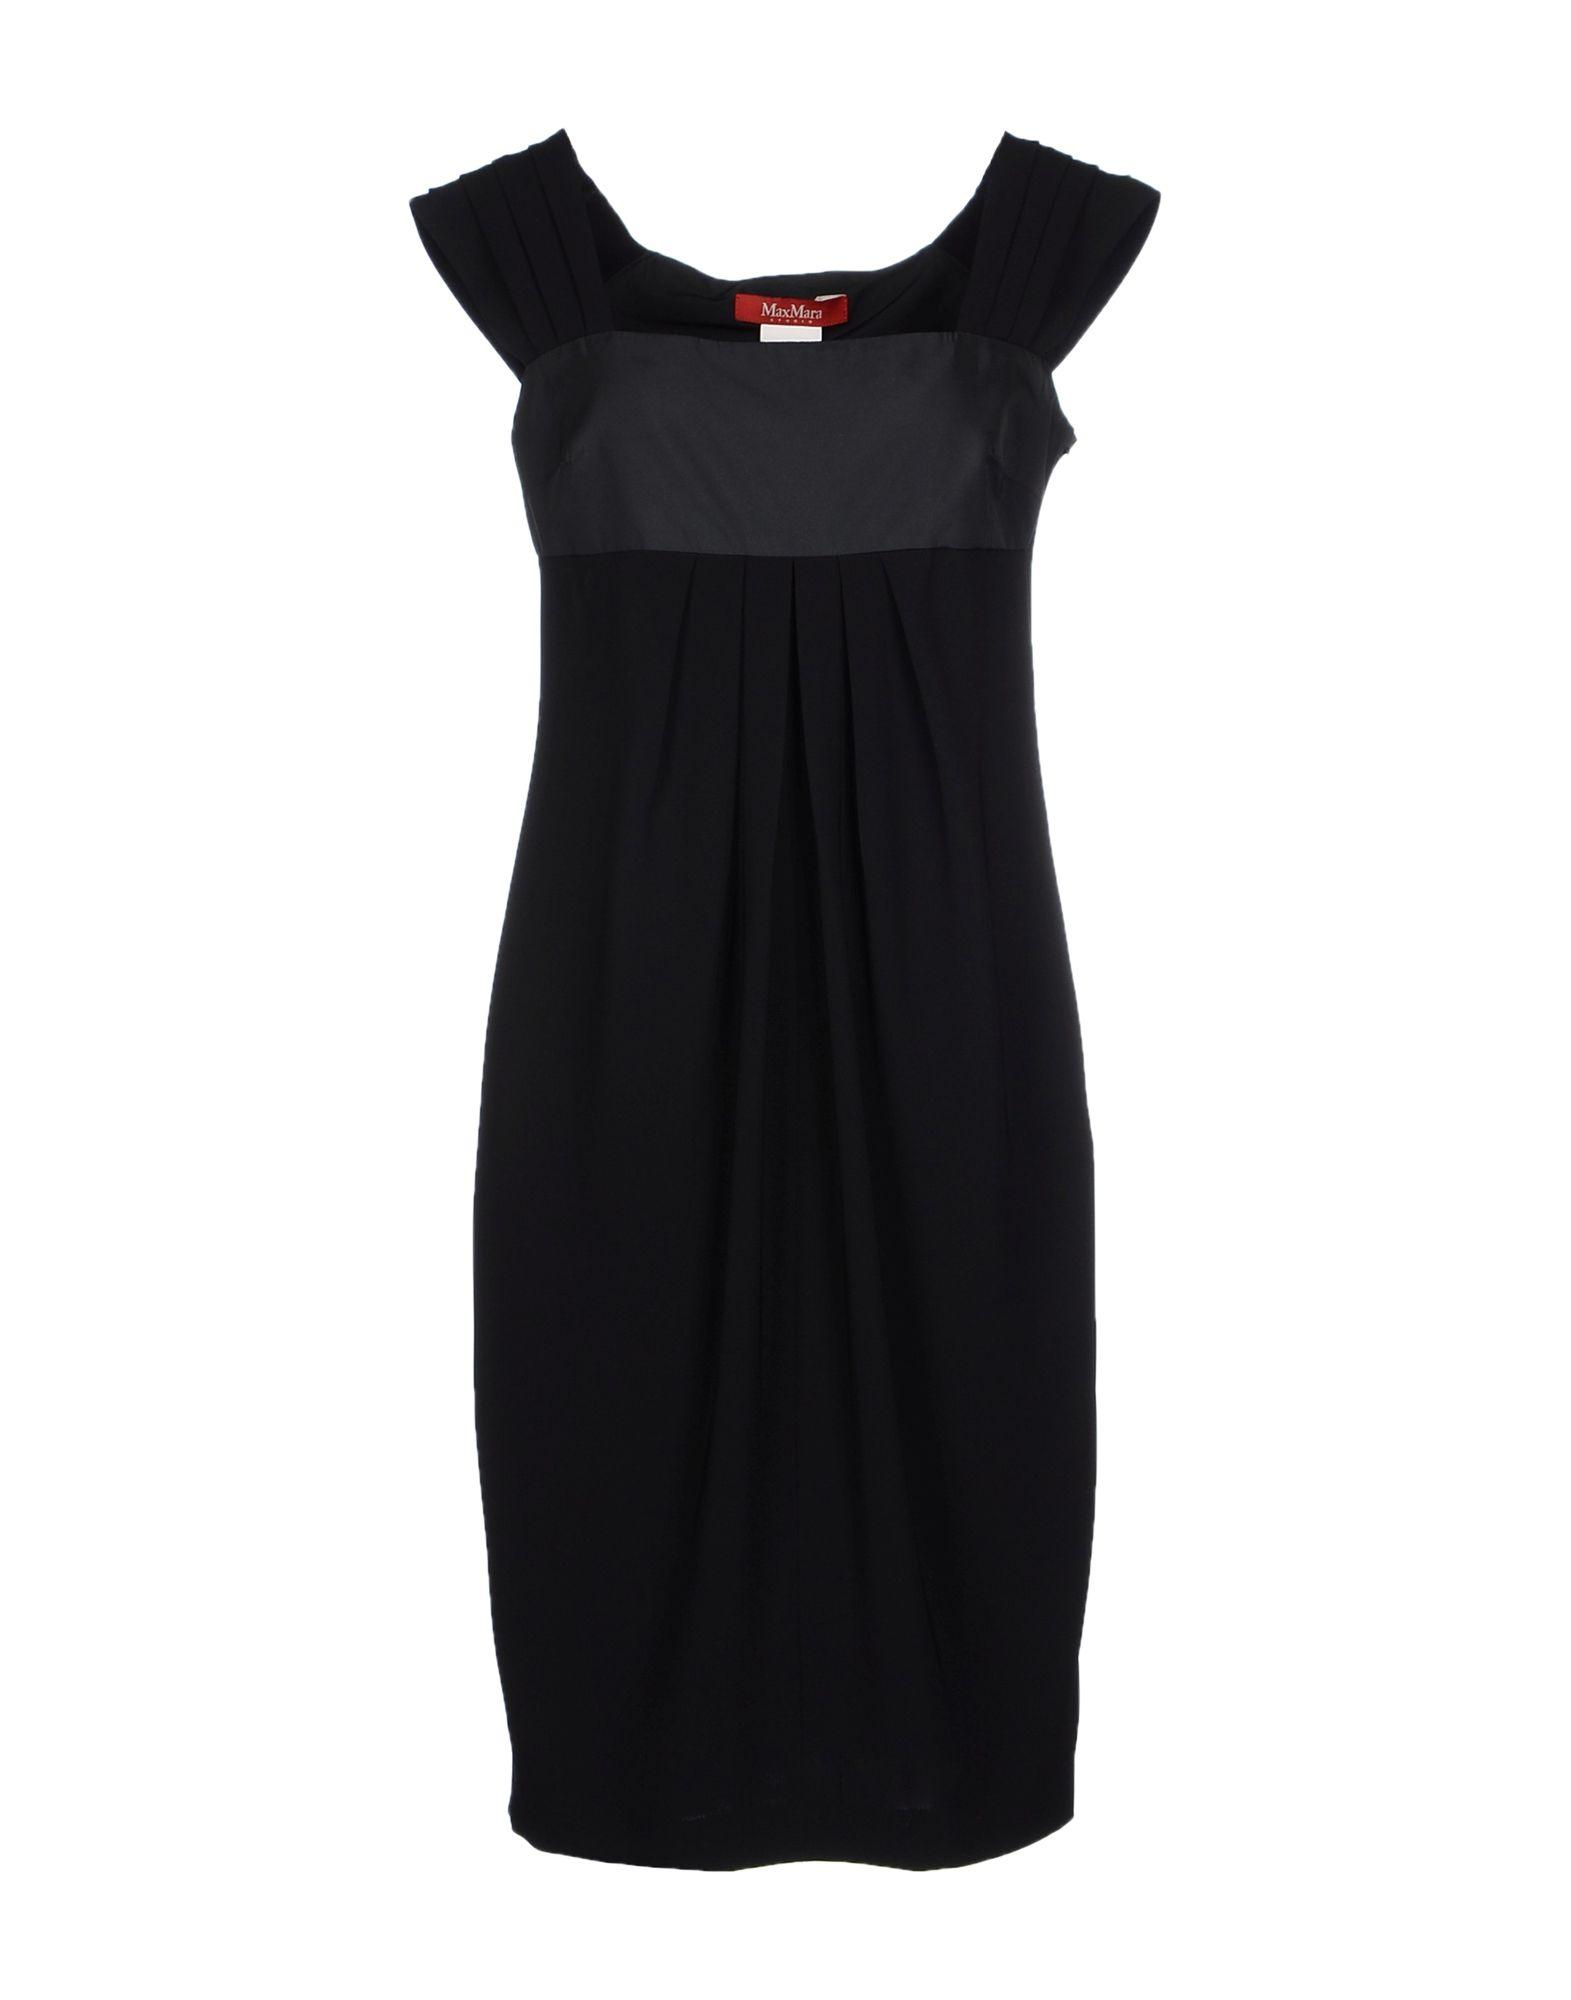 max mara studio knee length dress in black lyst. Black Bedroom Furniture Sets. Home Design Ideas